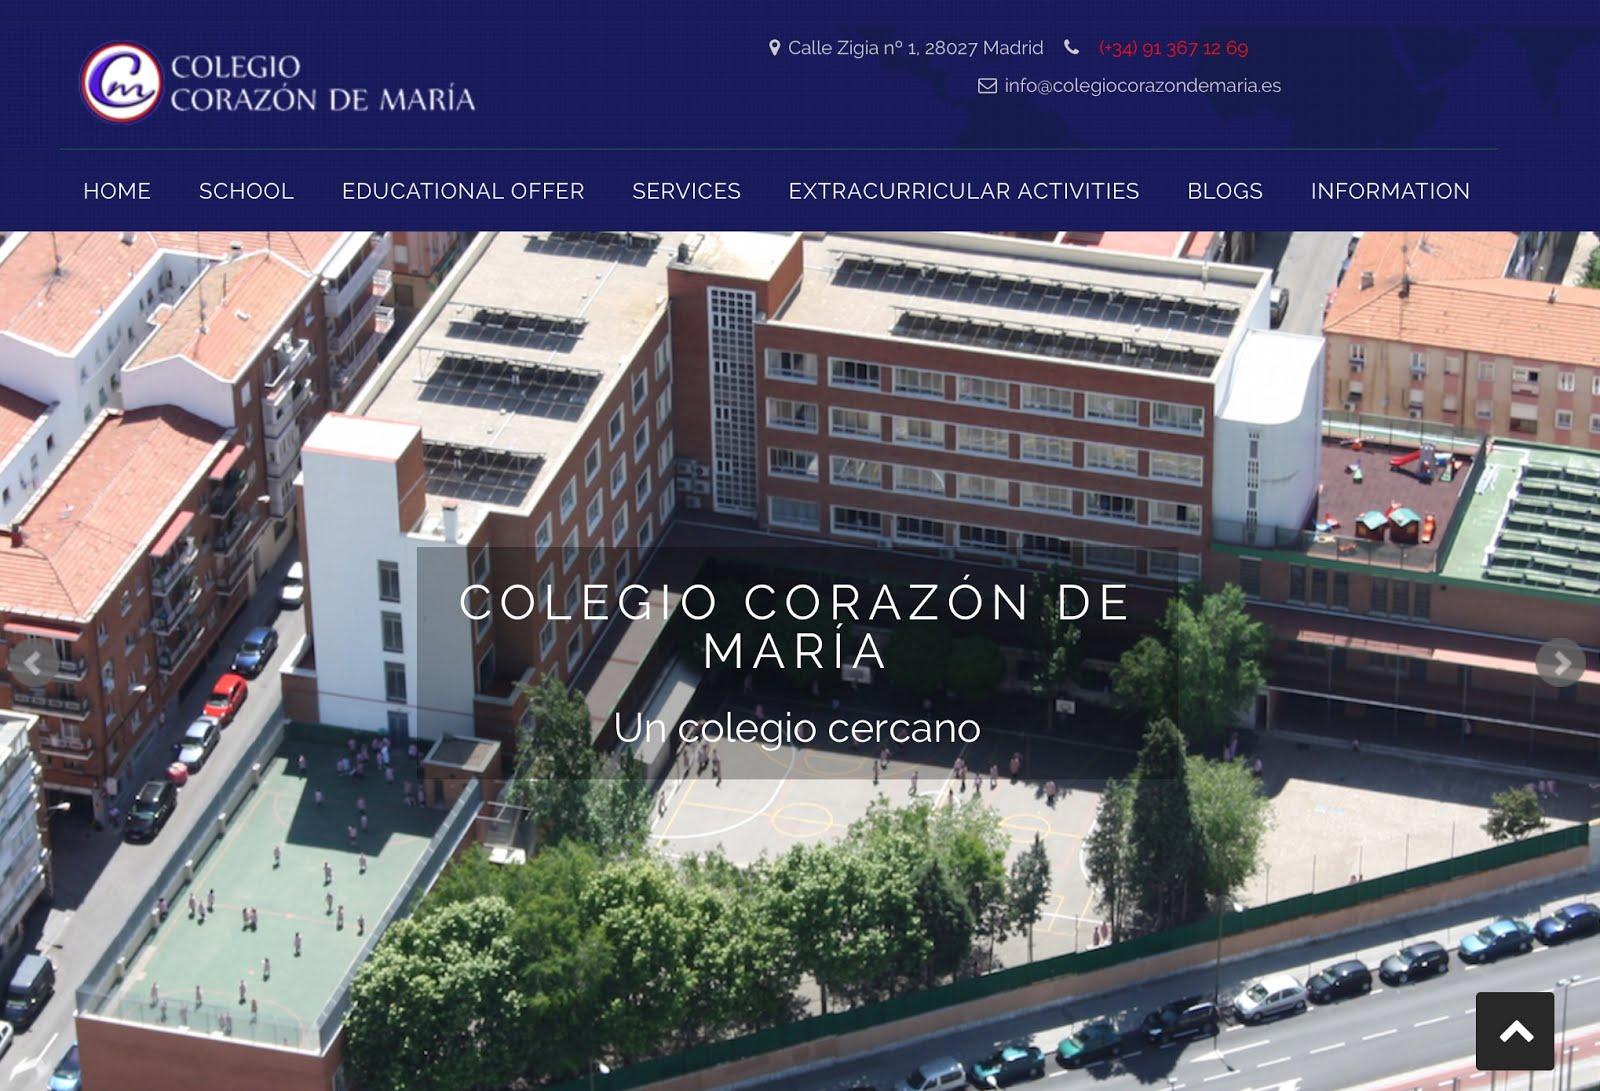 CORMAR Web page